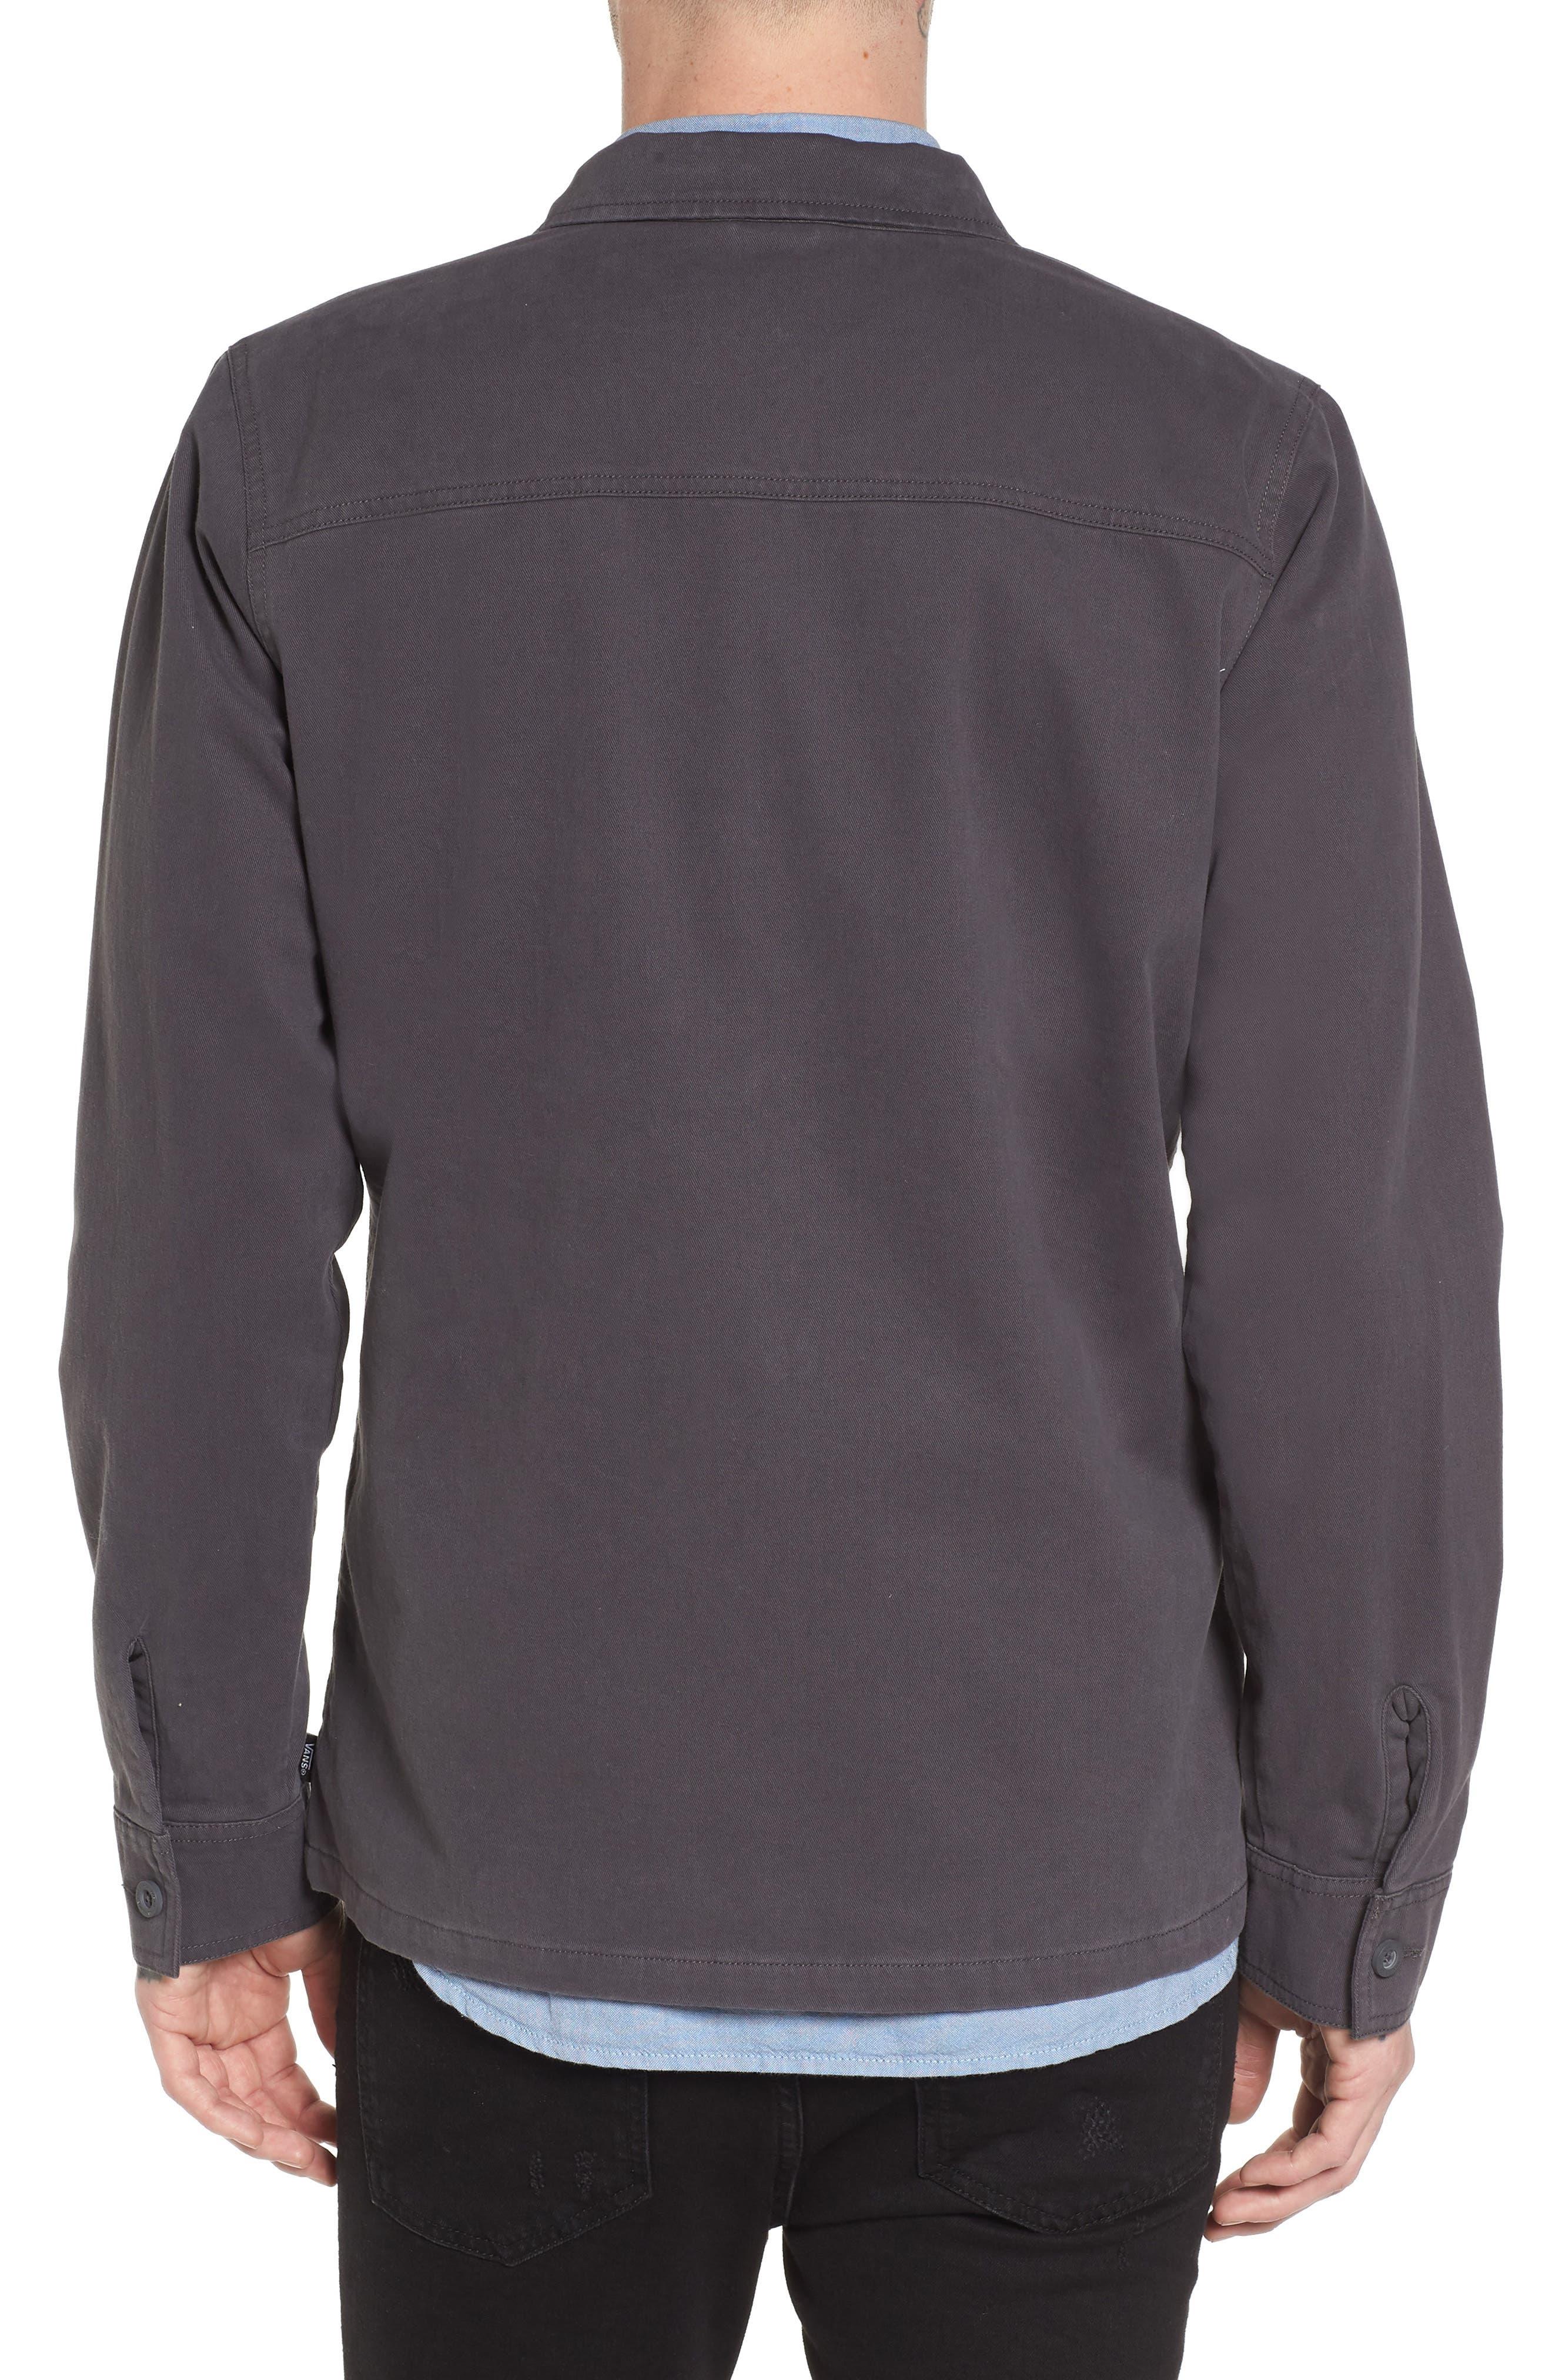 Belfair II Garage Jacket,                             Alternate thumbnail 2, color,                             Asphalt